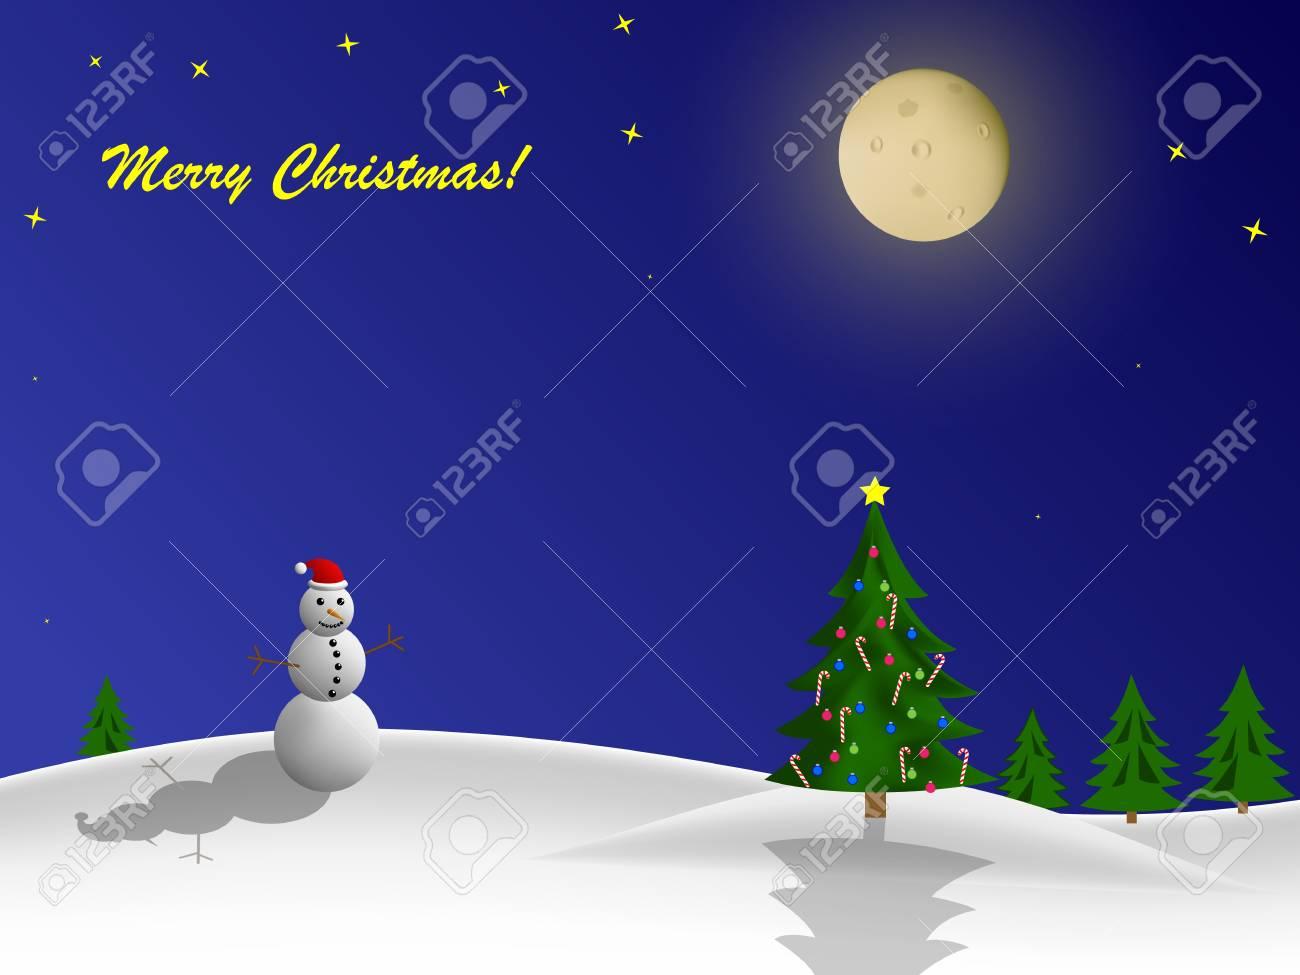 Christmas greeting card with snowman and christmas tree Stock Vector - 16798320